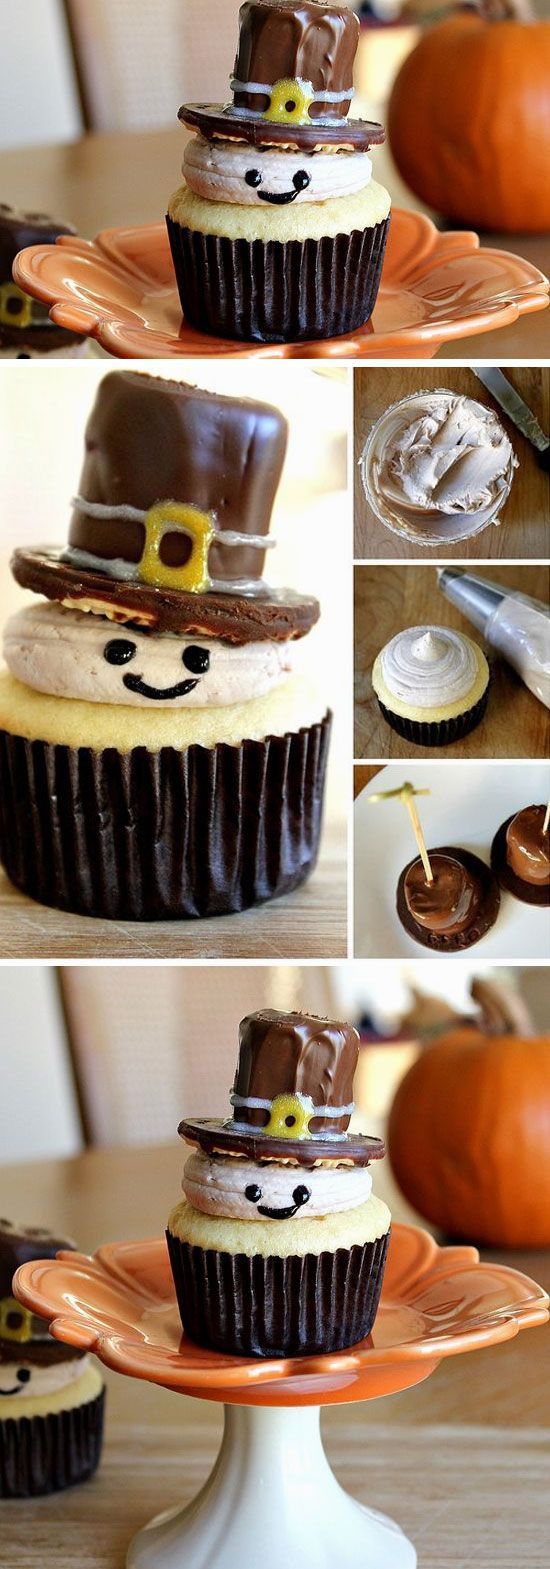 Easy Desserts For Kids  Pilgrim Cupcakes